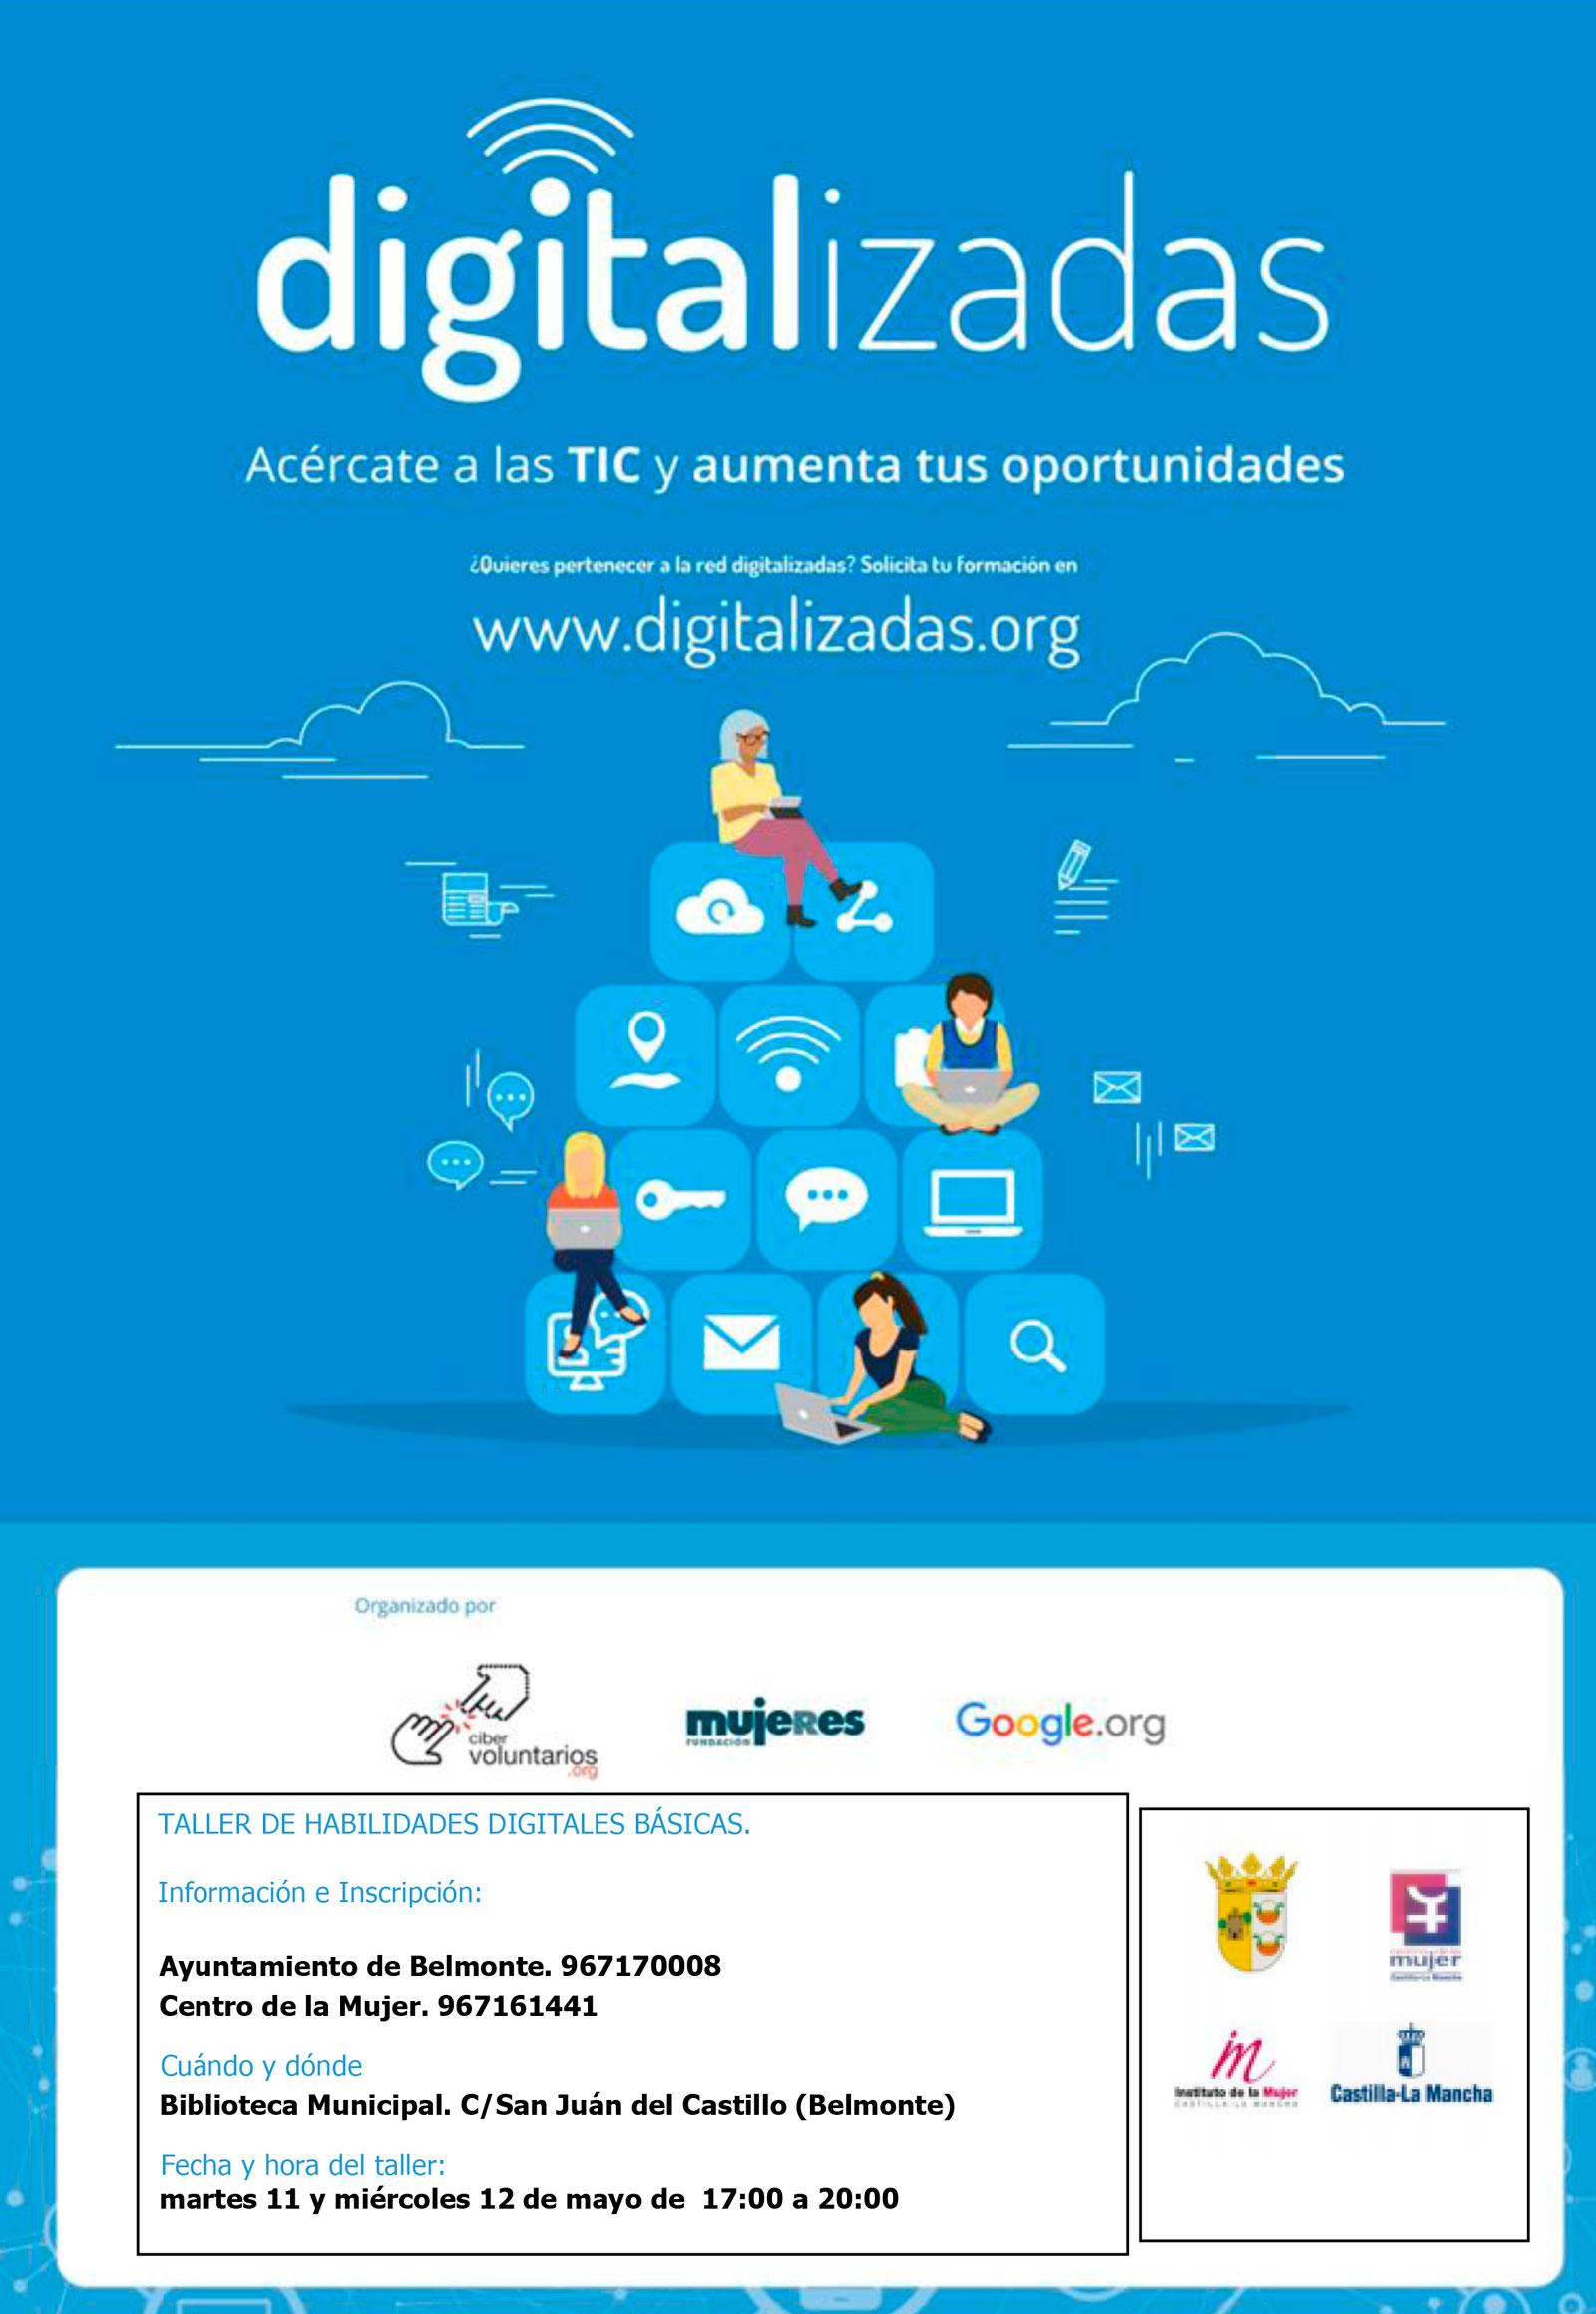 CartelDigitalizadas_Belmonte1